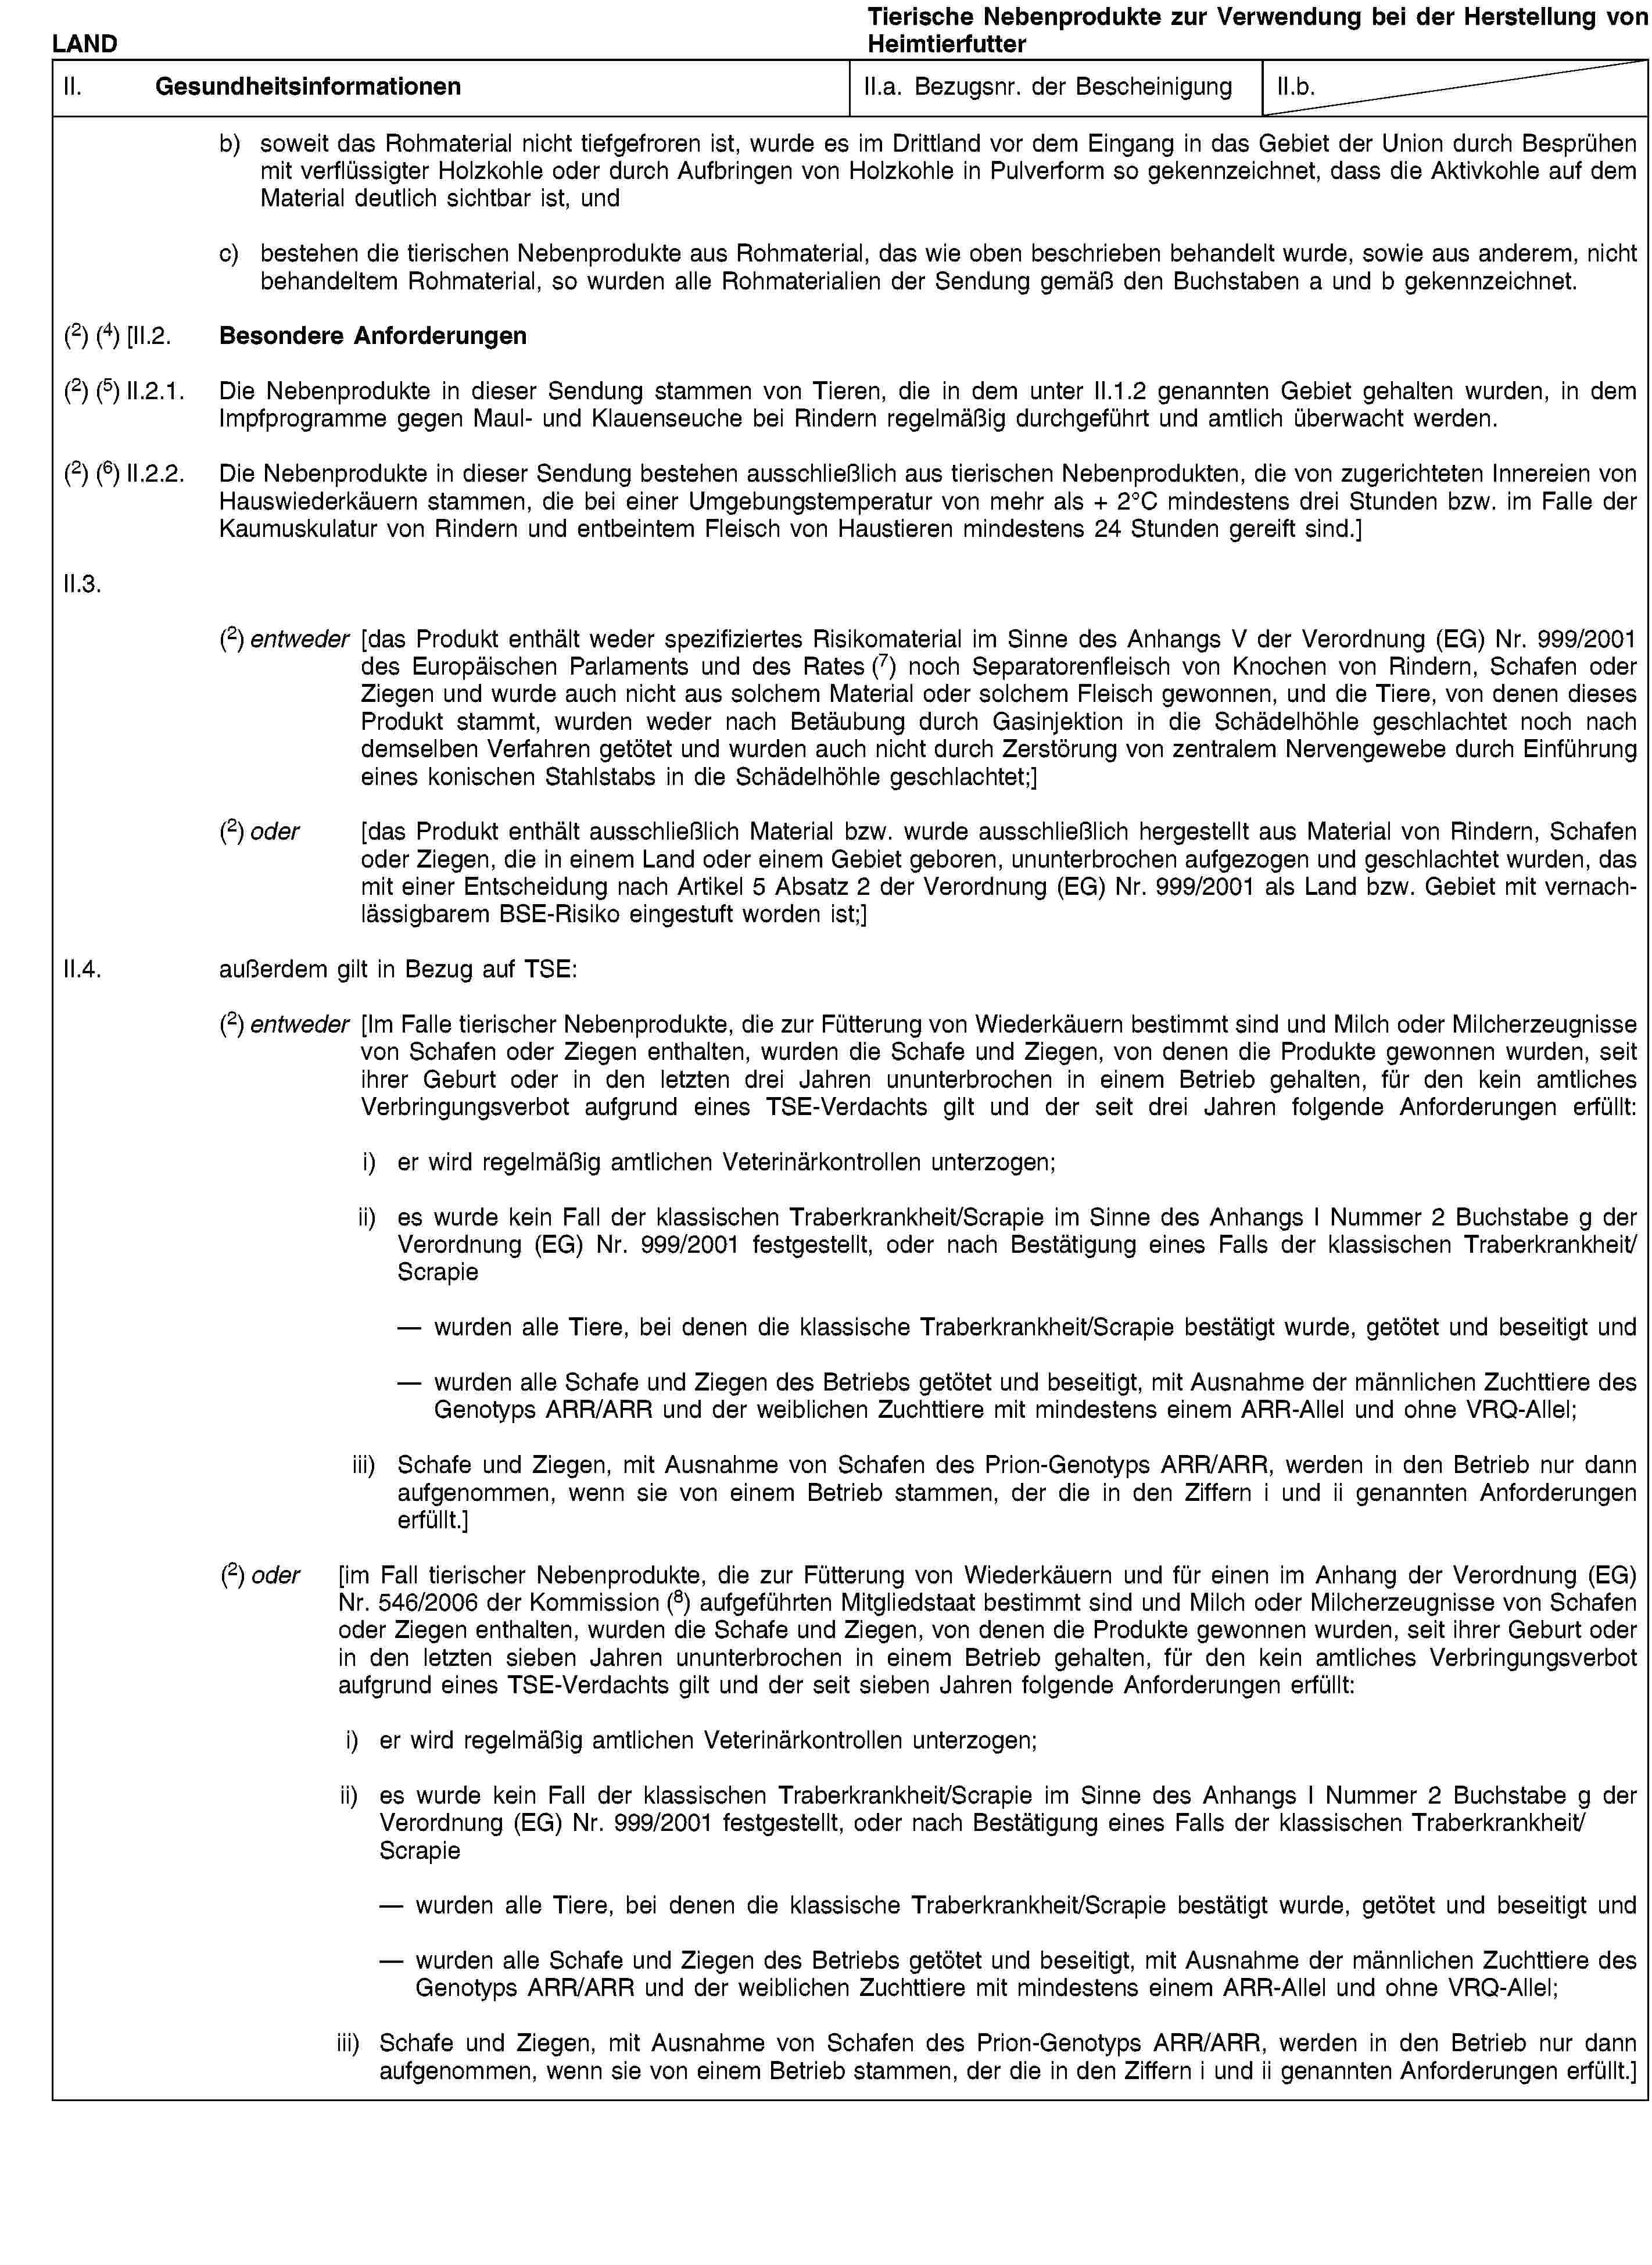 EUR-Lex - 02011R0142-20150223 - EN - EUR-Lex